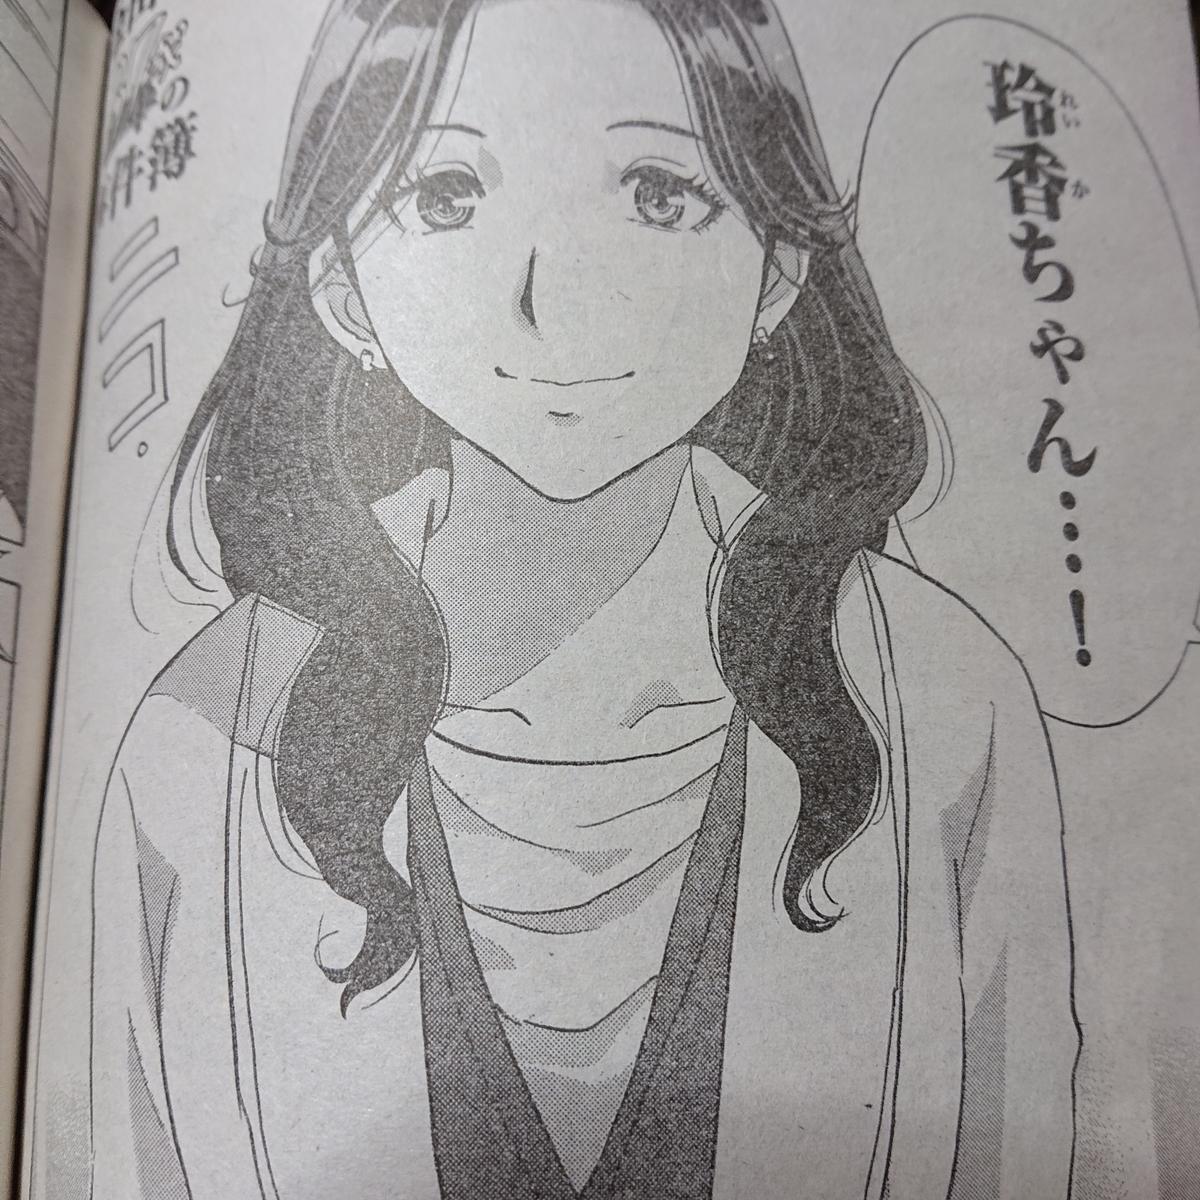 f:id:shikokumimami1:20200211172410j:plain